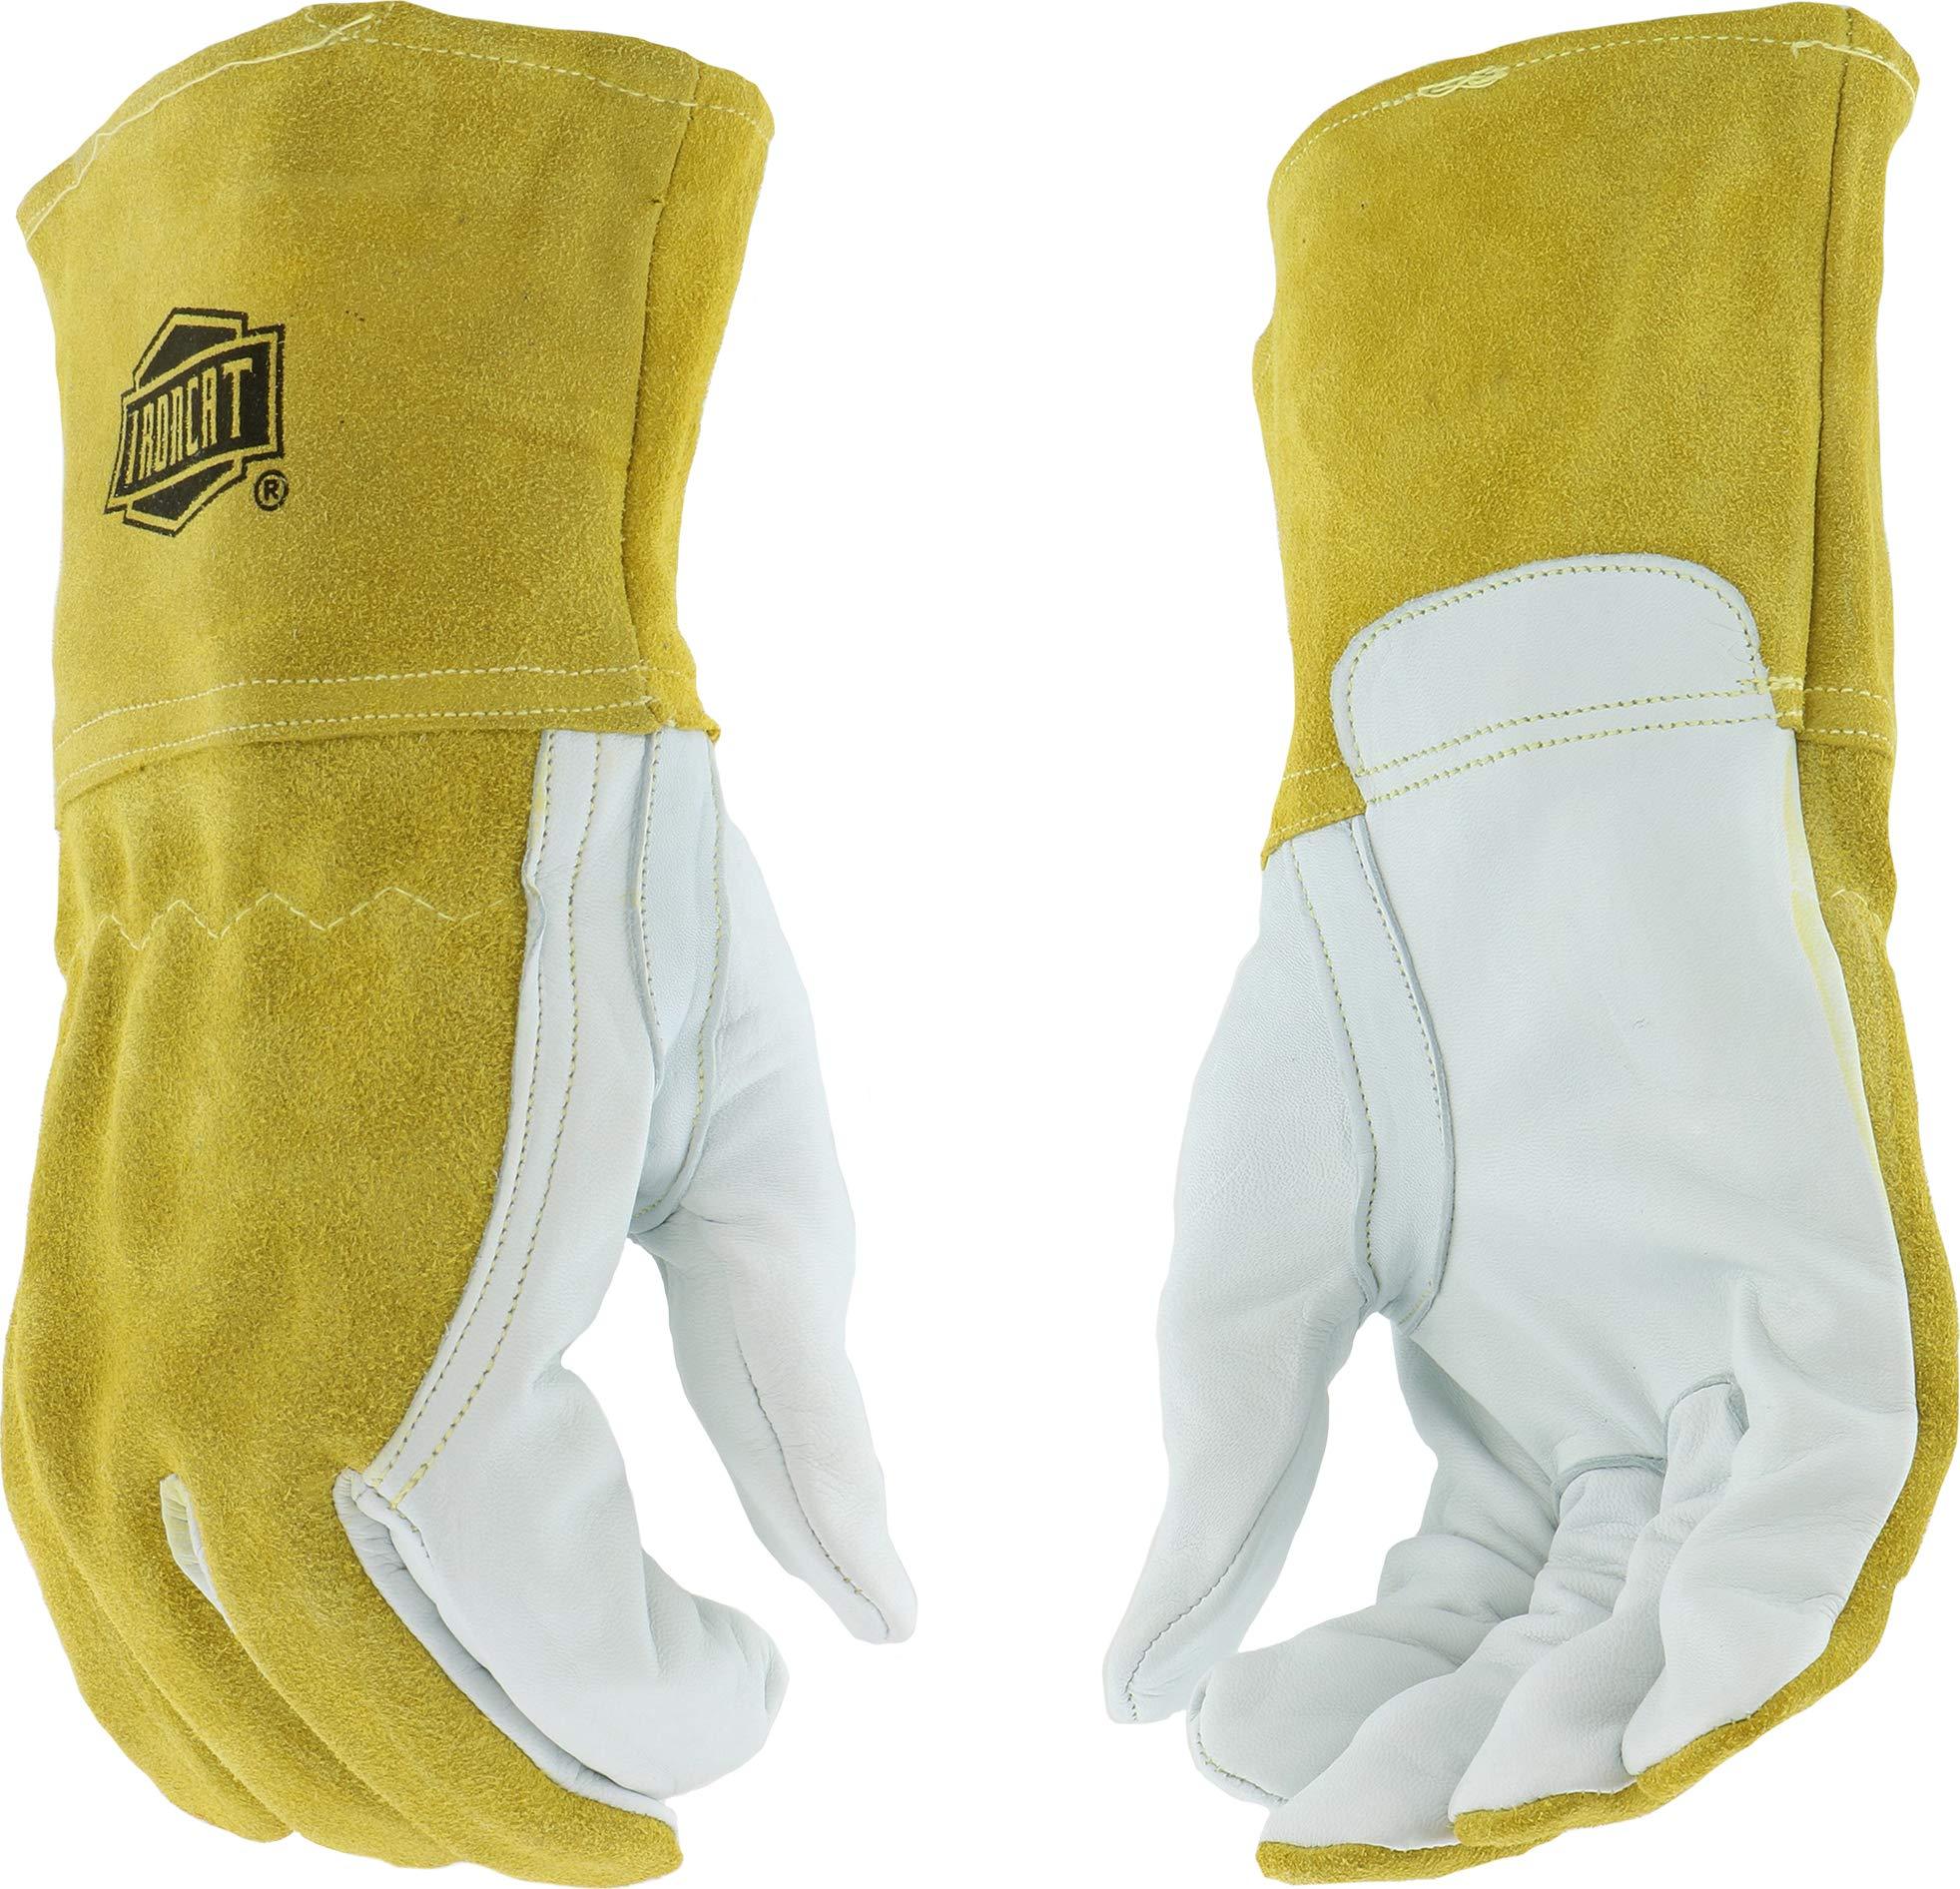 West Chester IRONCAT 6143 Premium Grain Goatskin Leather Palm, Split Cowhide Leather Back MIG Welding Gloves: Medium, 12 Pairs